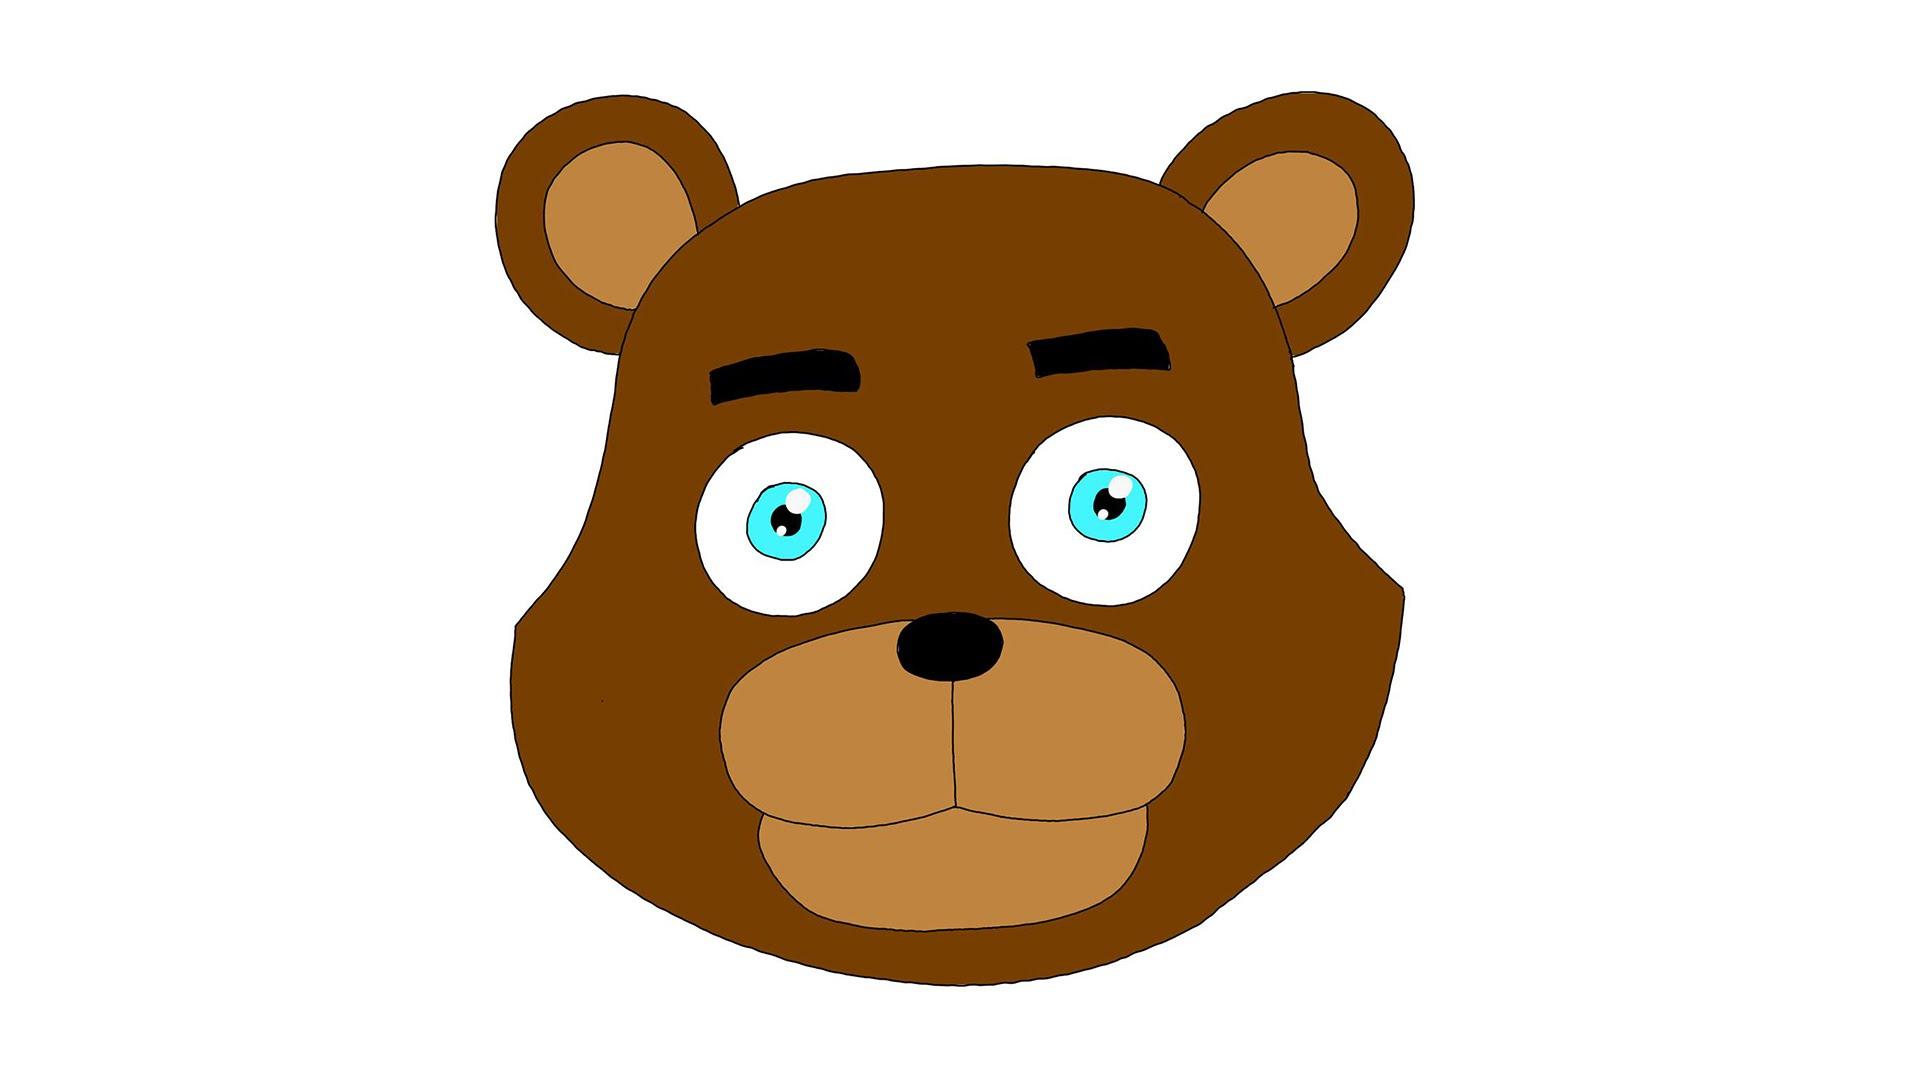 1920x1080 Drawing Teddy Bear Face How To Draw A Teddy Bear Drawingforall